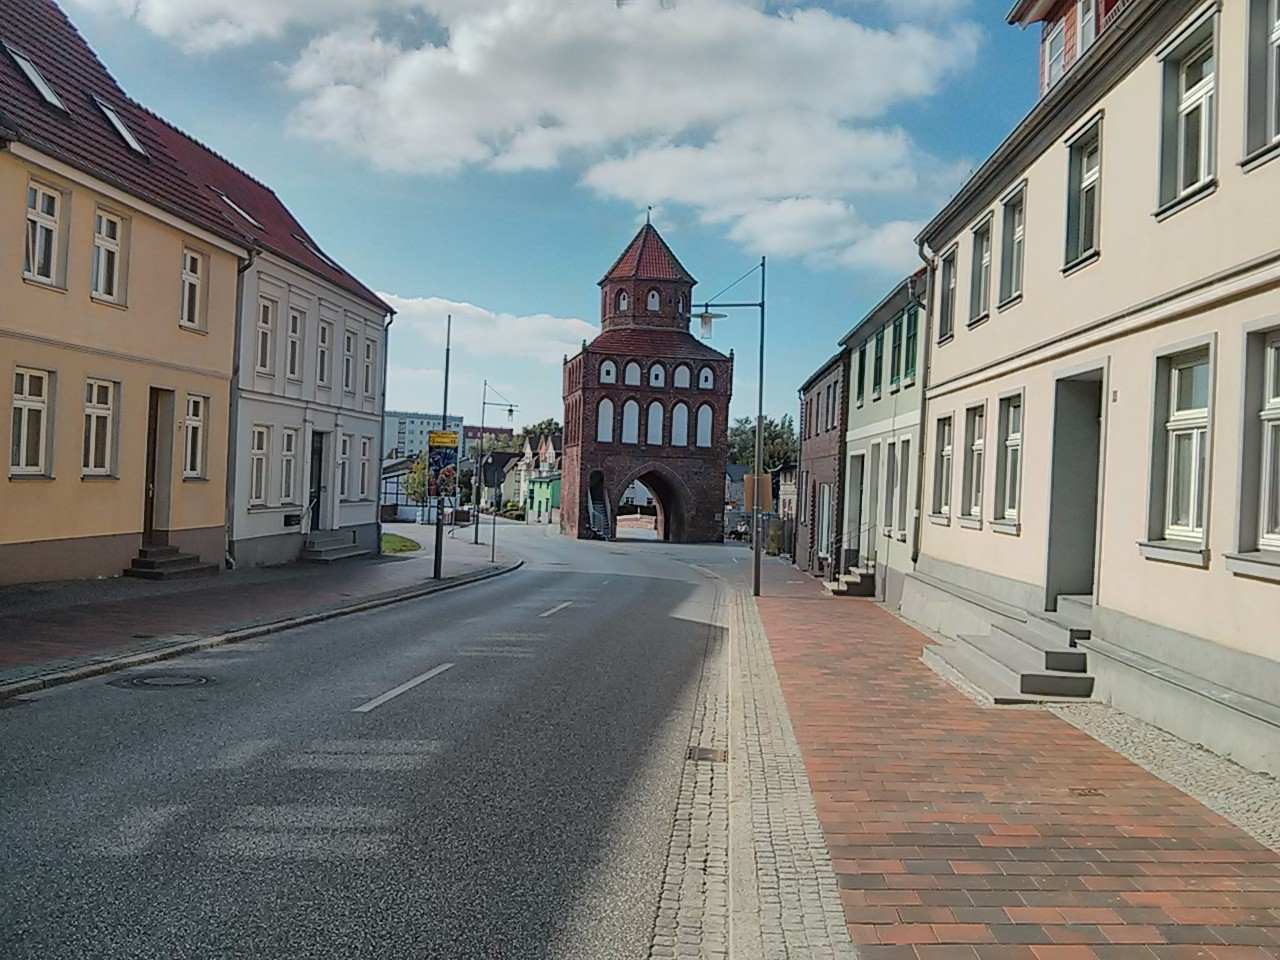 Rostocker Tor in Ribnitz Damgarten